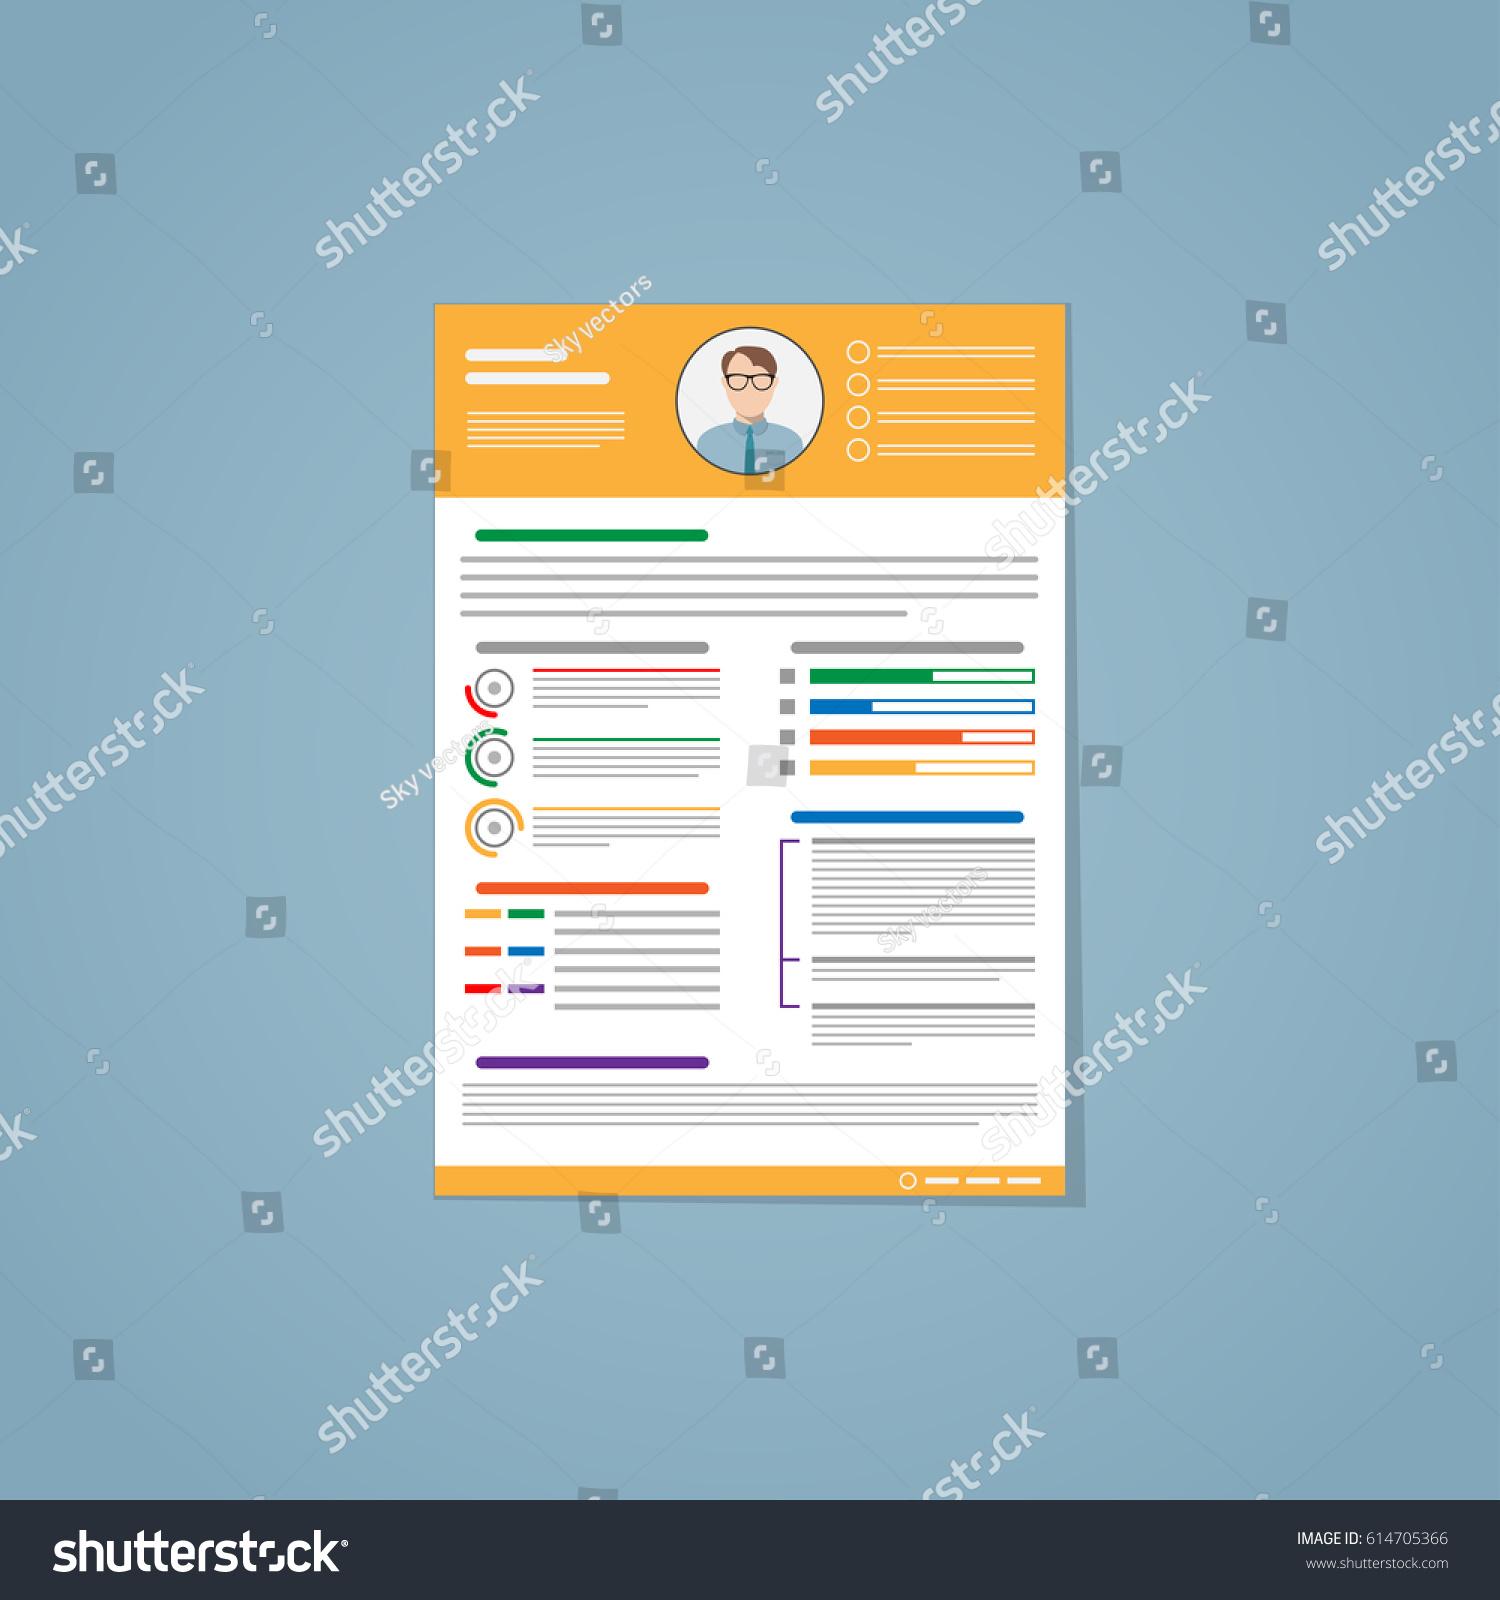 Resume Flat Style Yellow Lines Photo Stock Vector 614705366